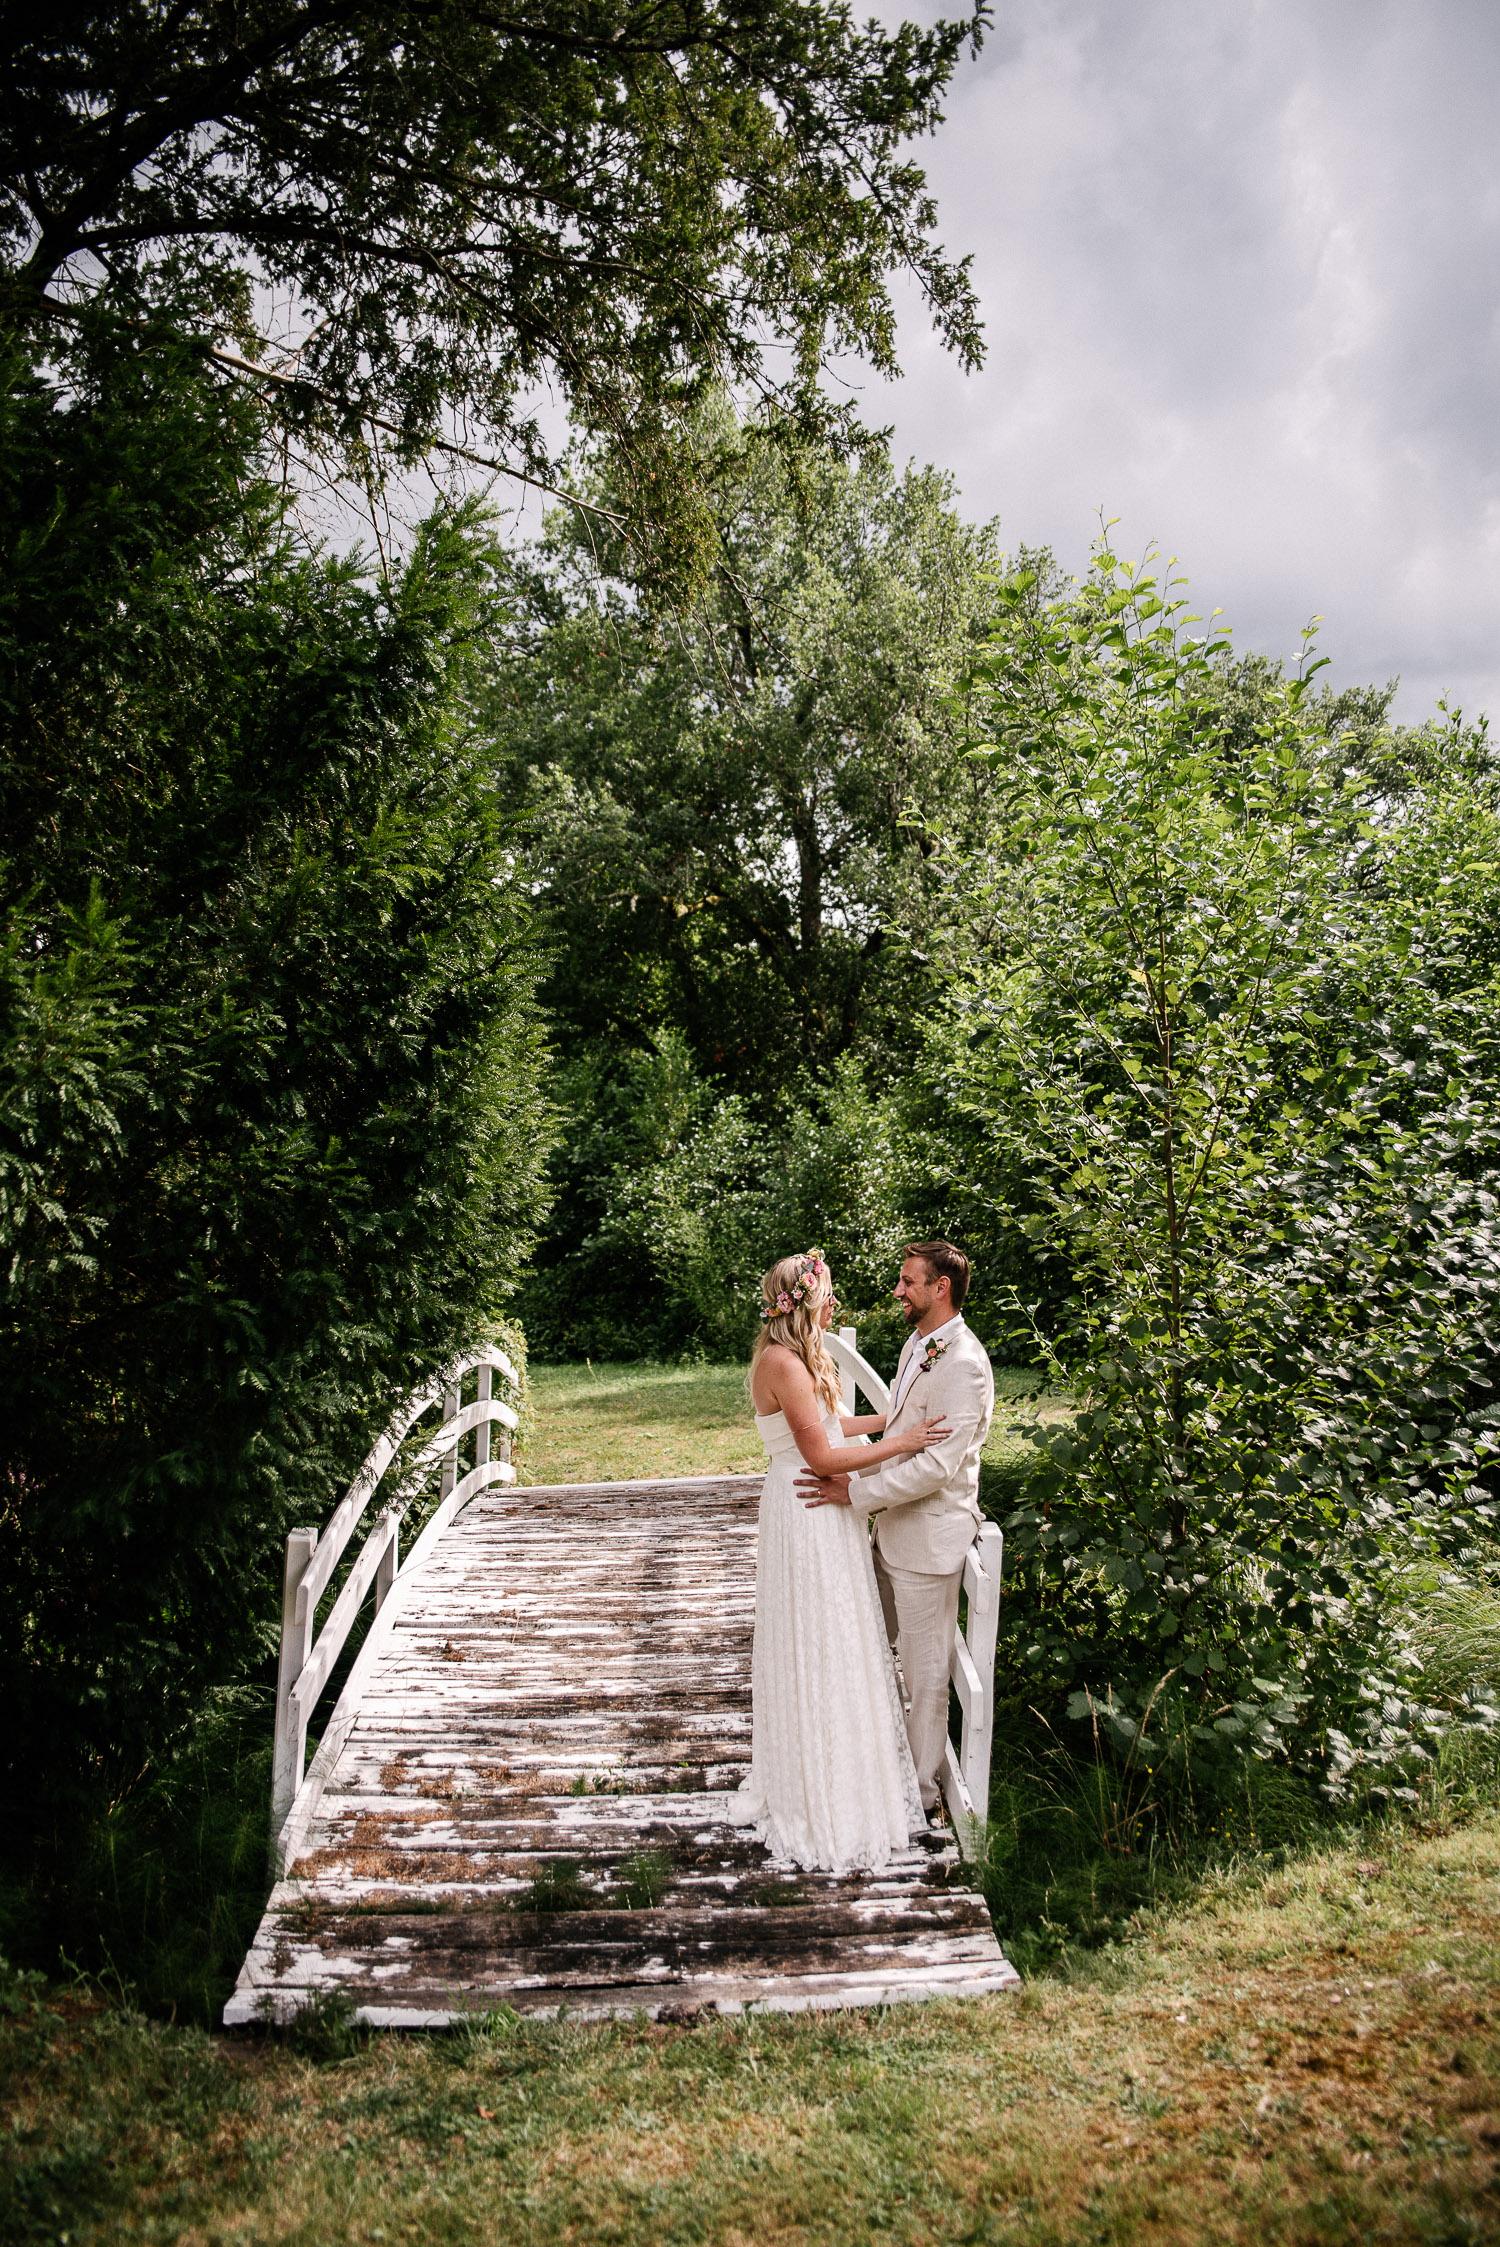 chateau_de_lisse_gers_wedding_katy_webb_photography_france_UK74